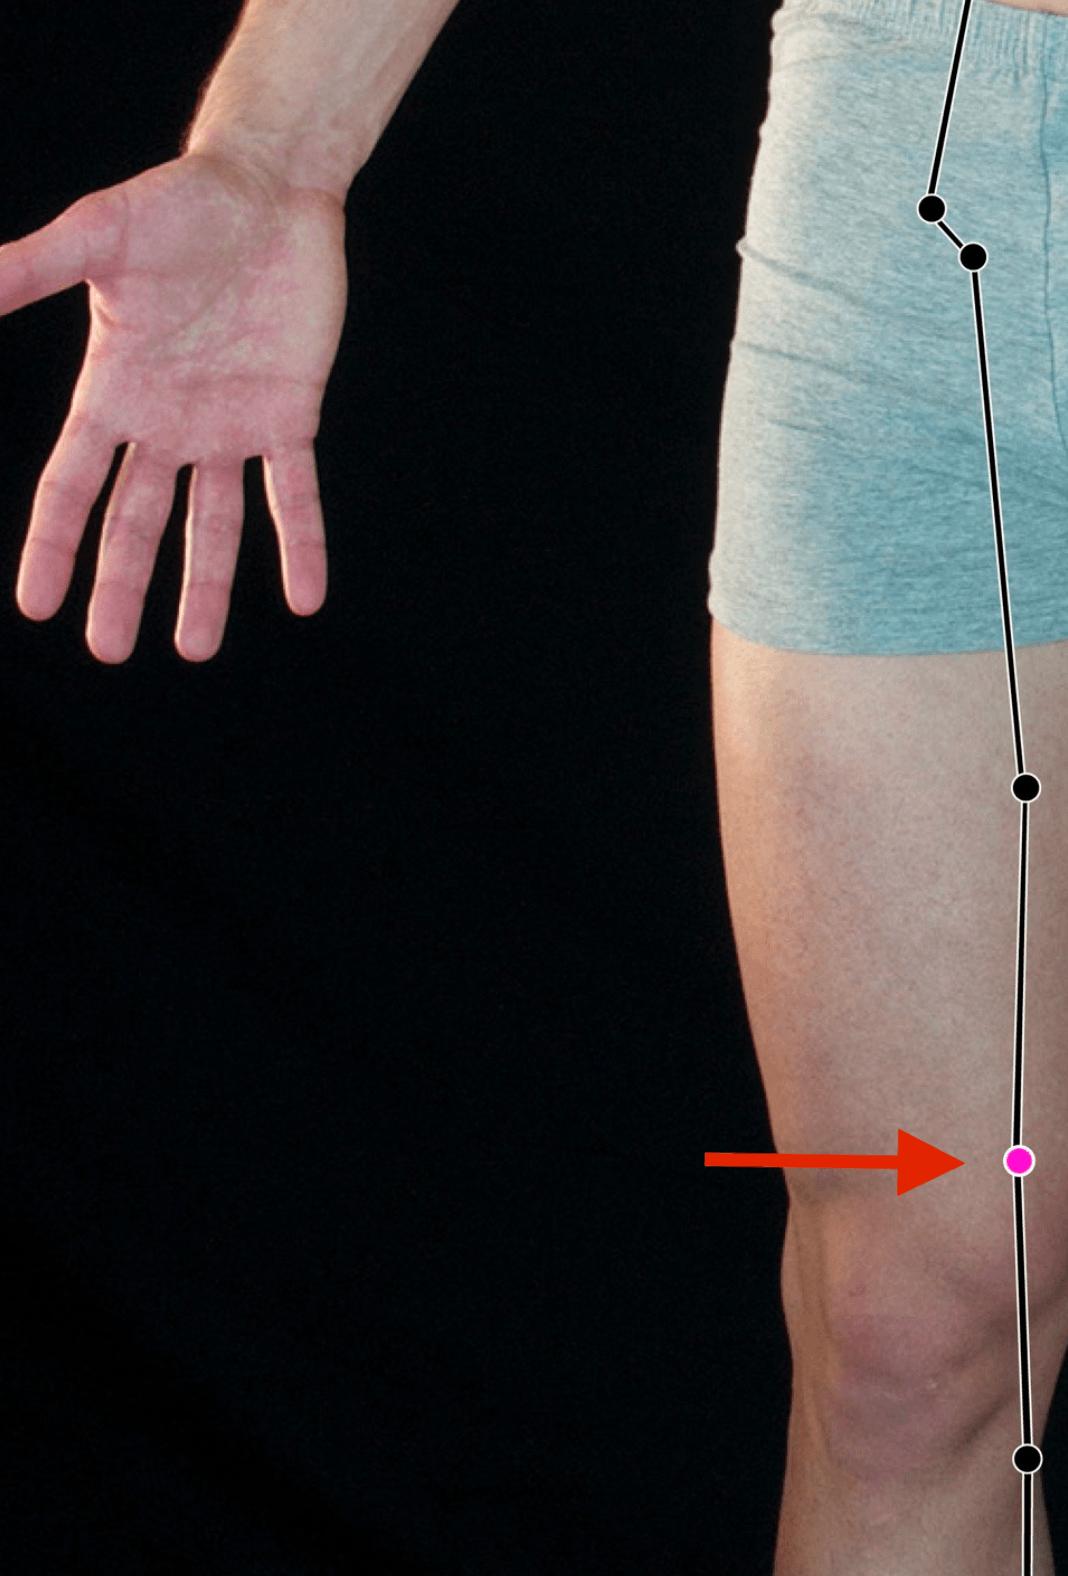 Spleen 10 acupressure point